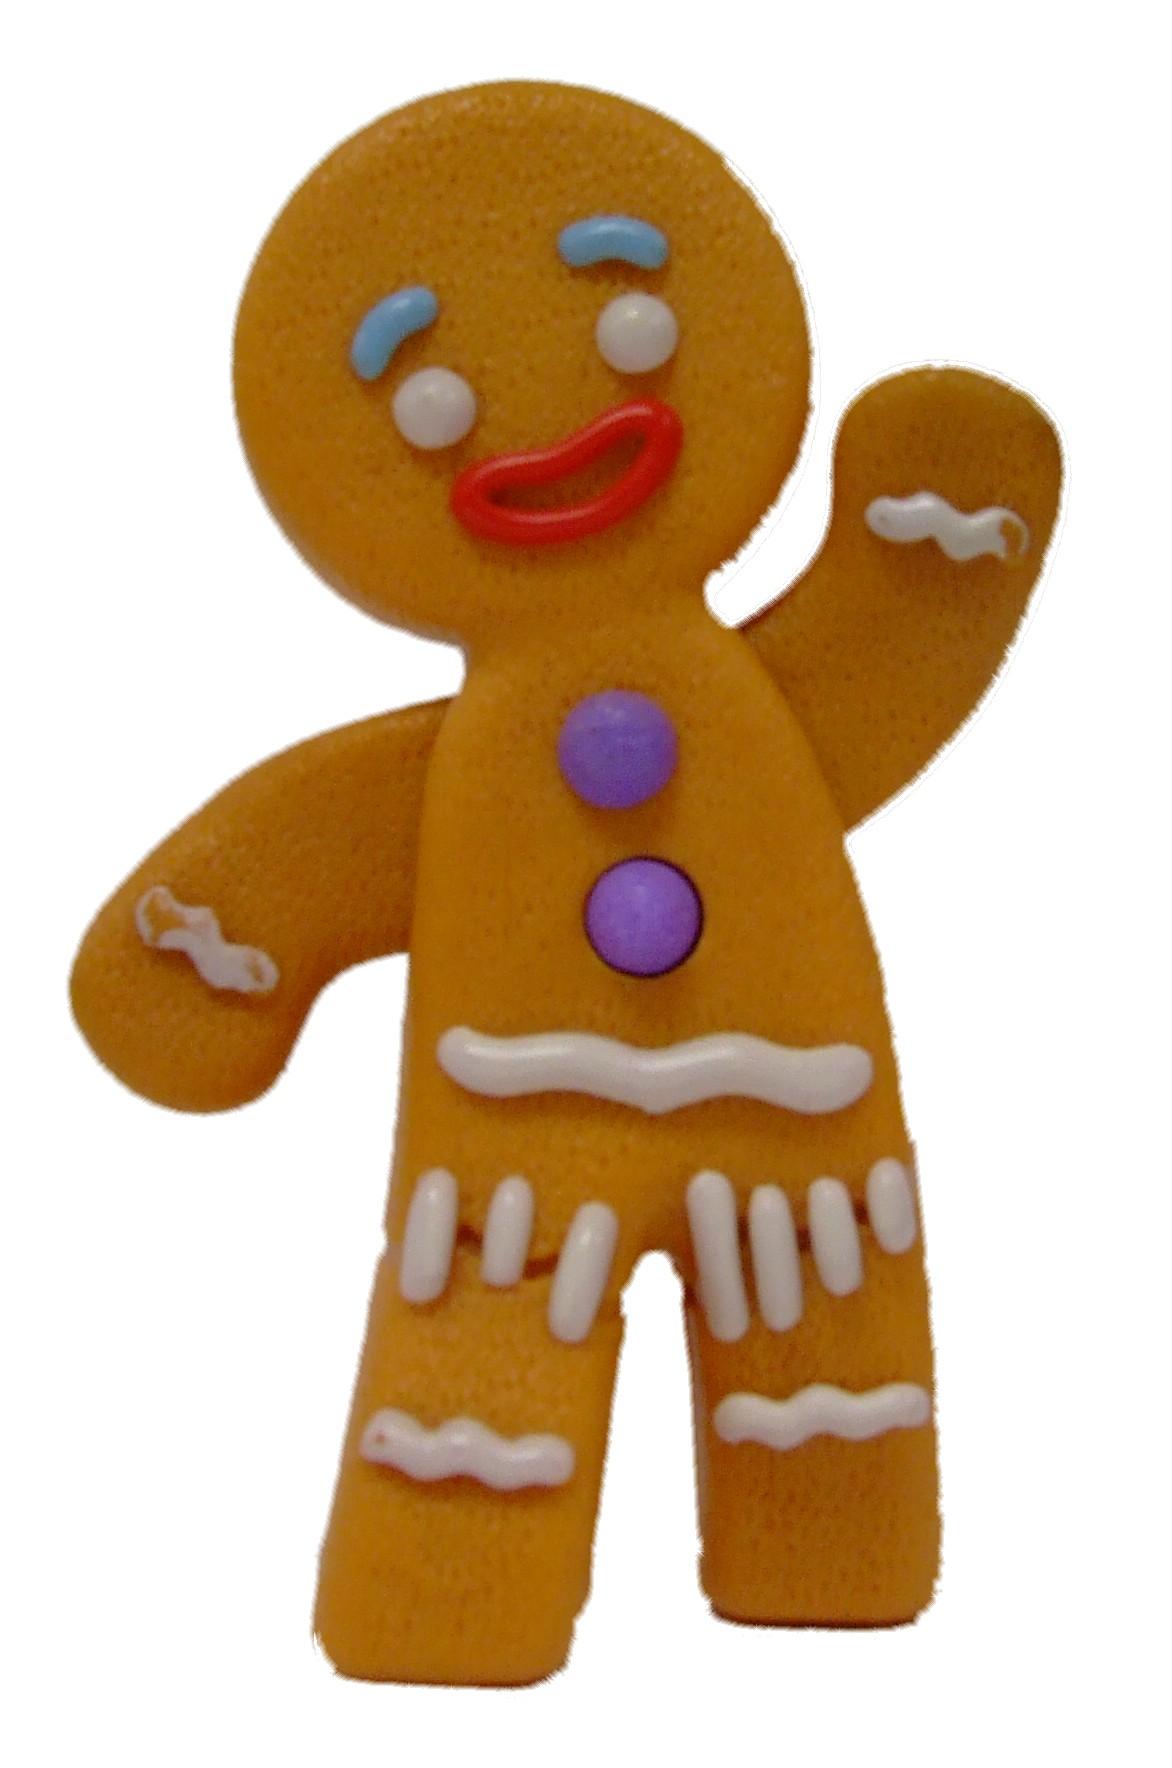 1172x1768 Christmas Clip Art And Free Graphics Gingerbread Man Christmas